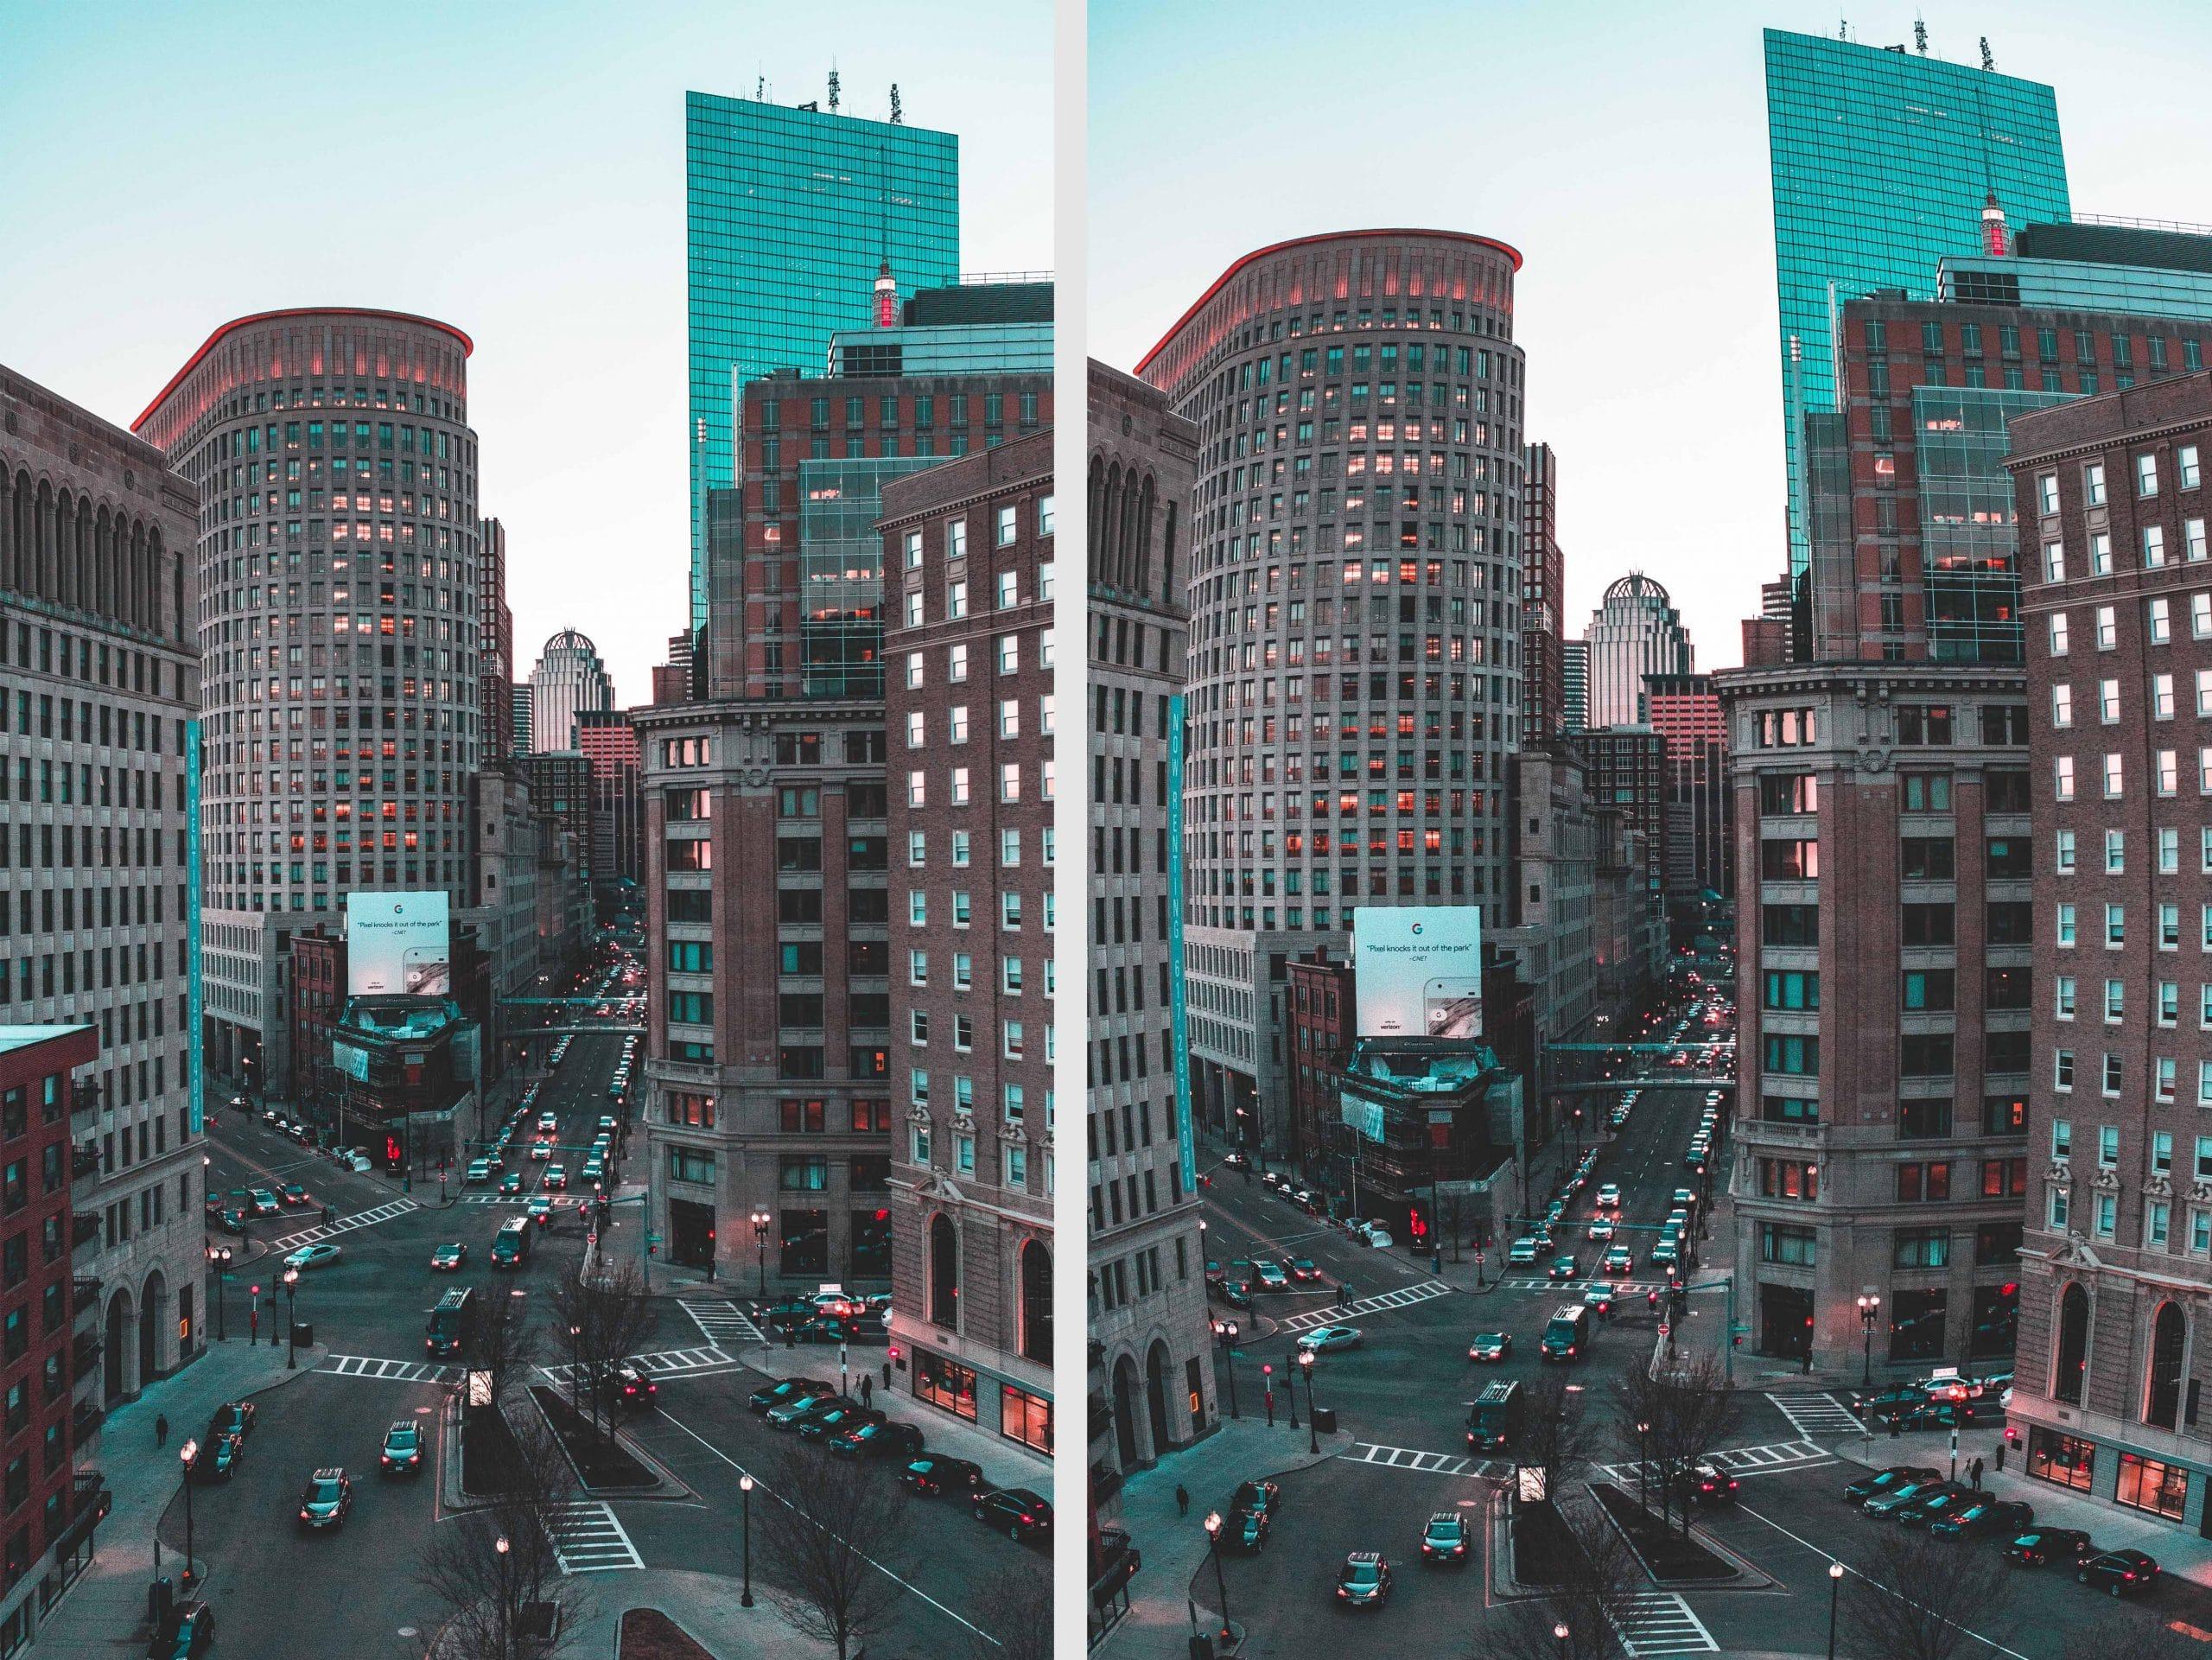 Image distortion in city landscape